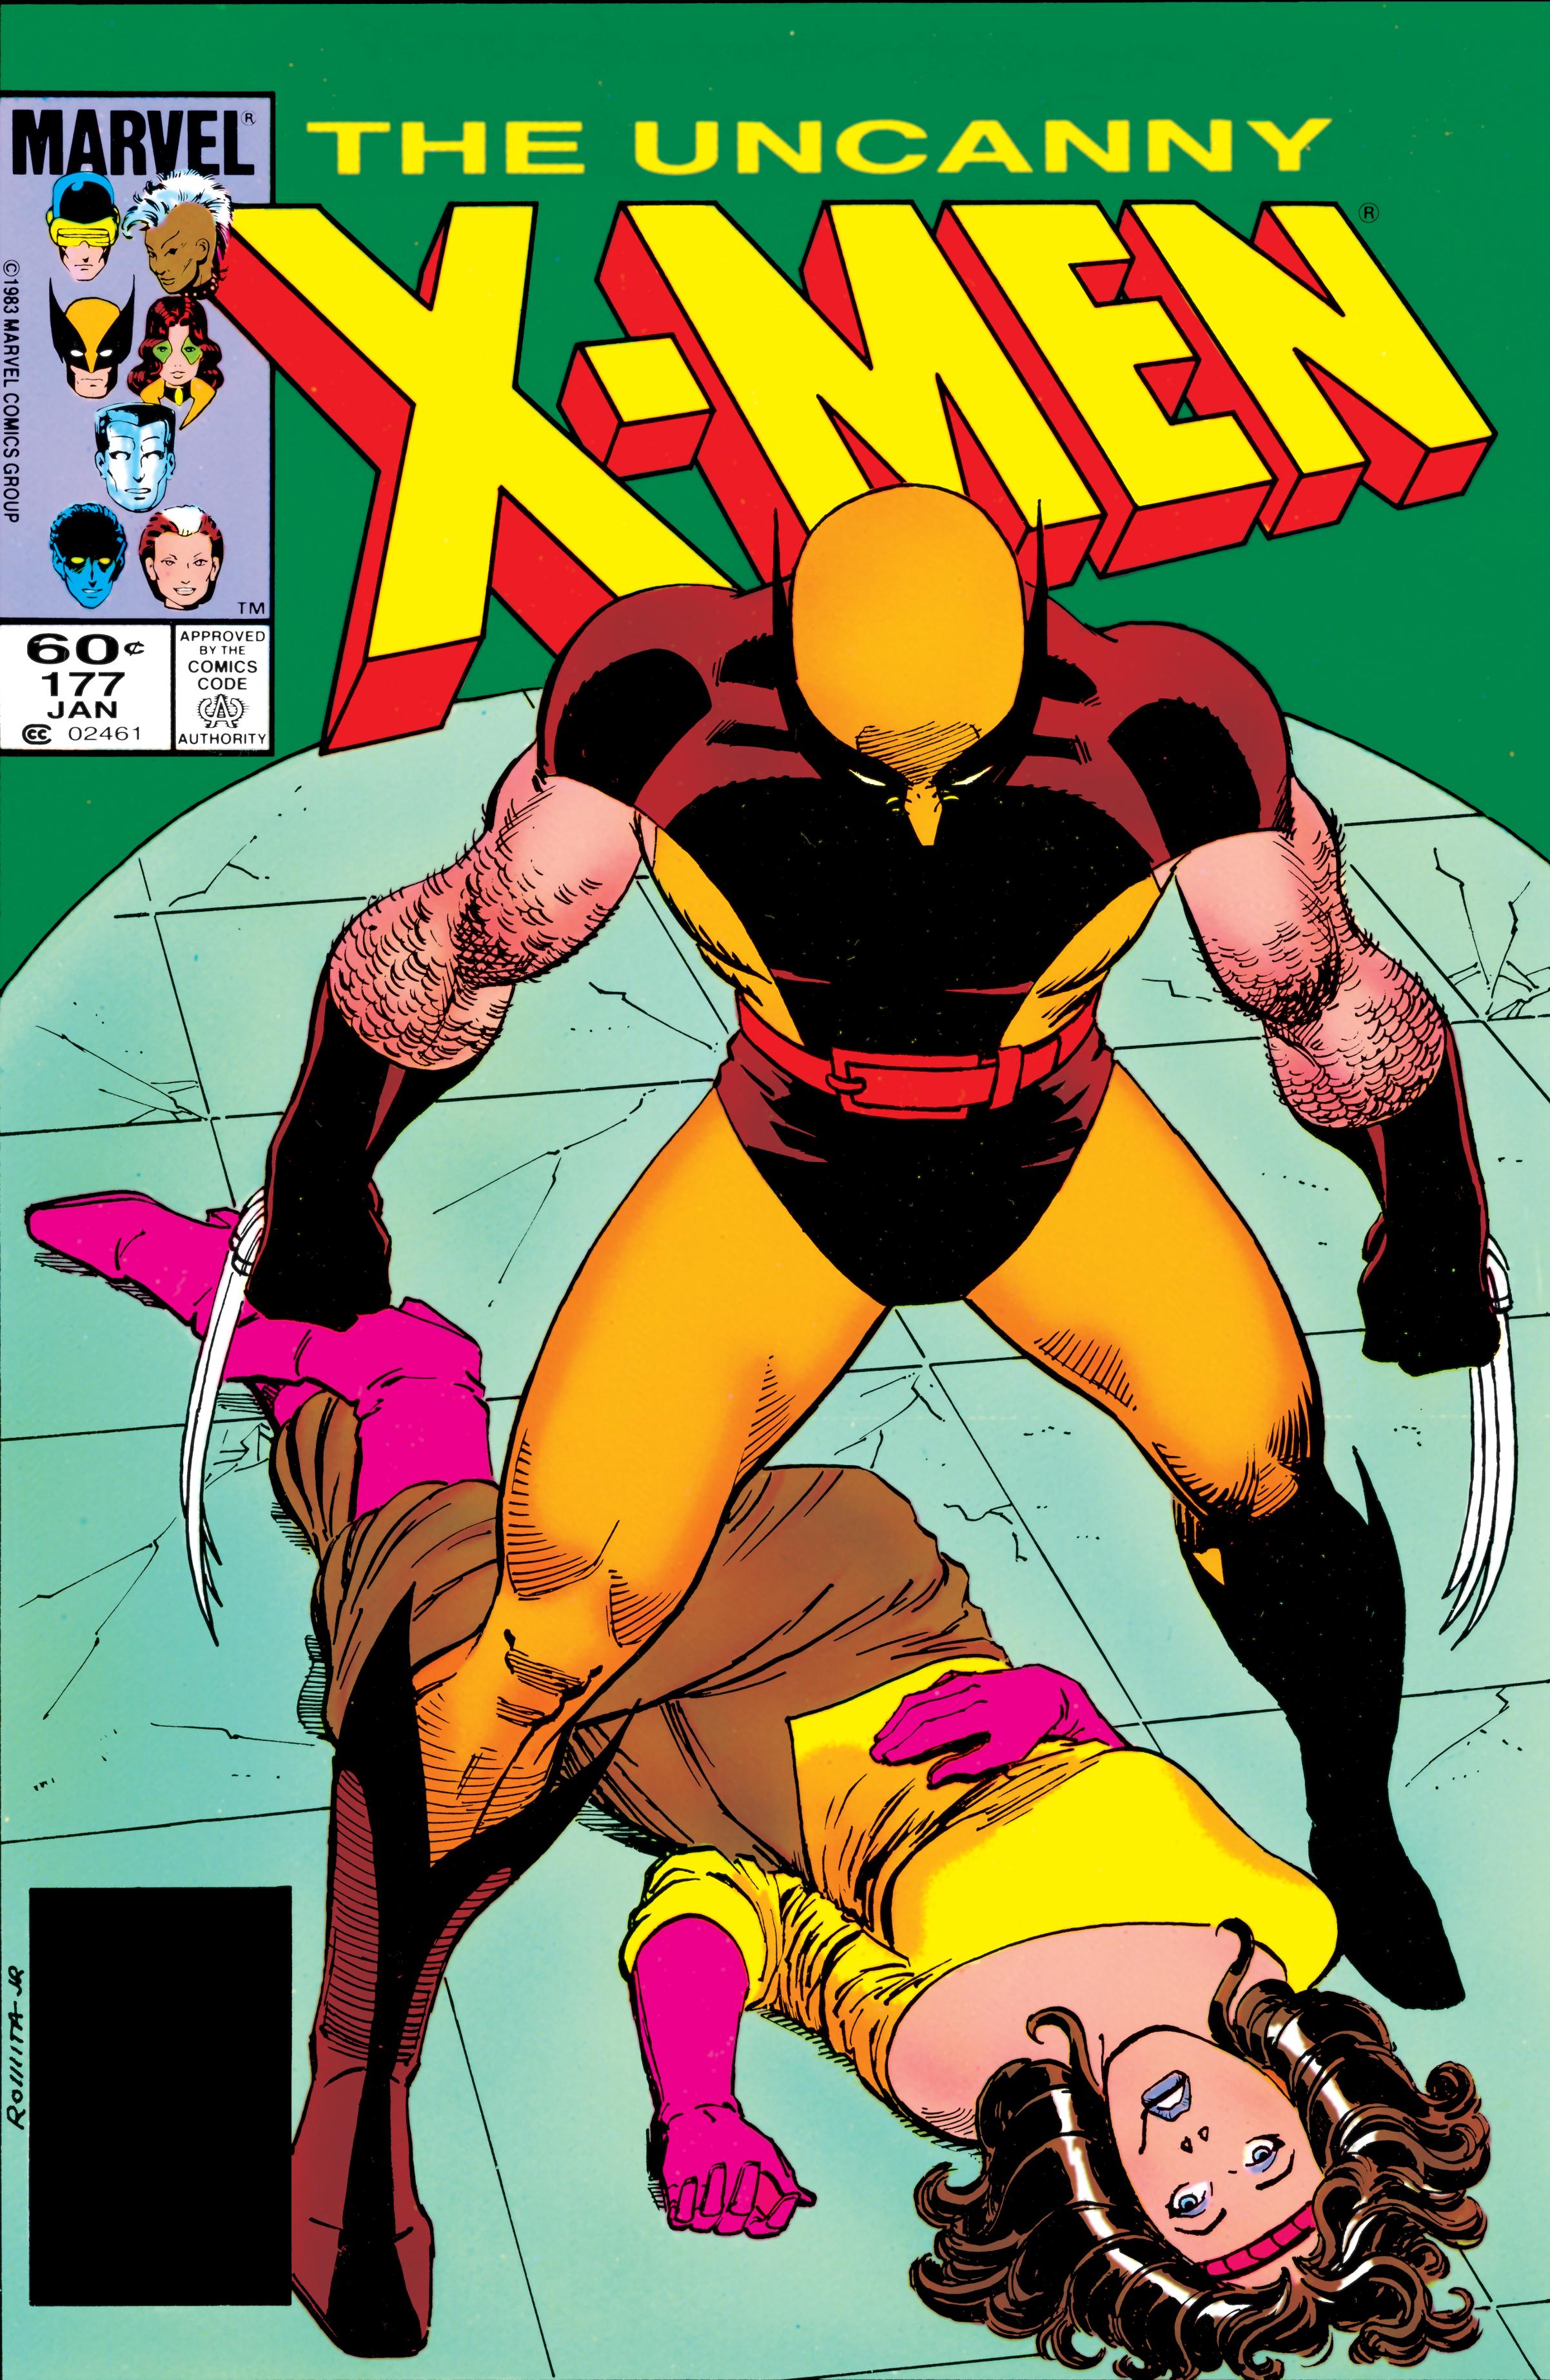 Uncanny X-Men (1963) #177